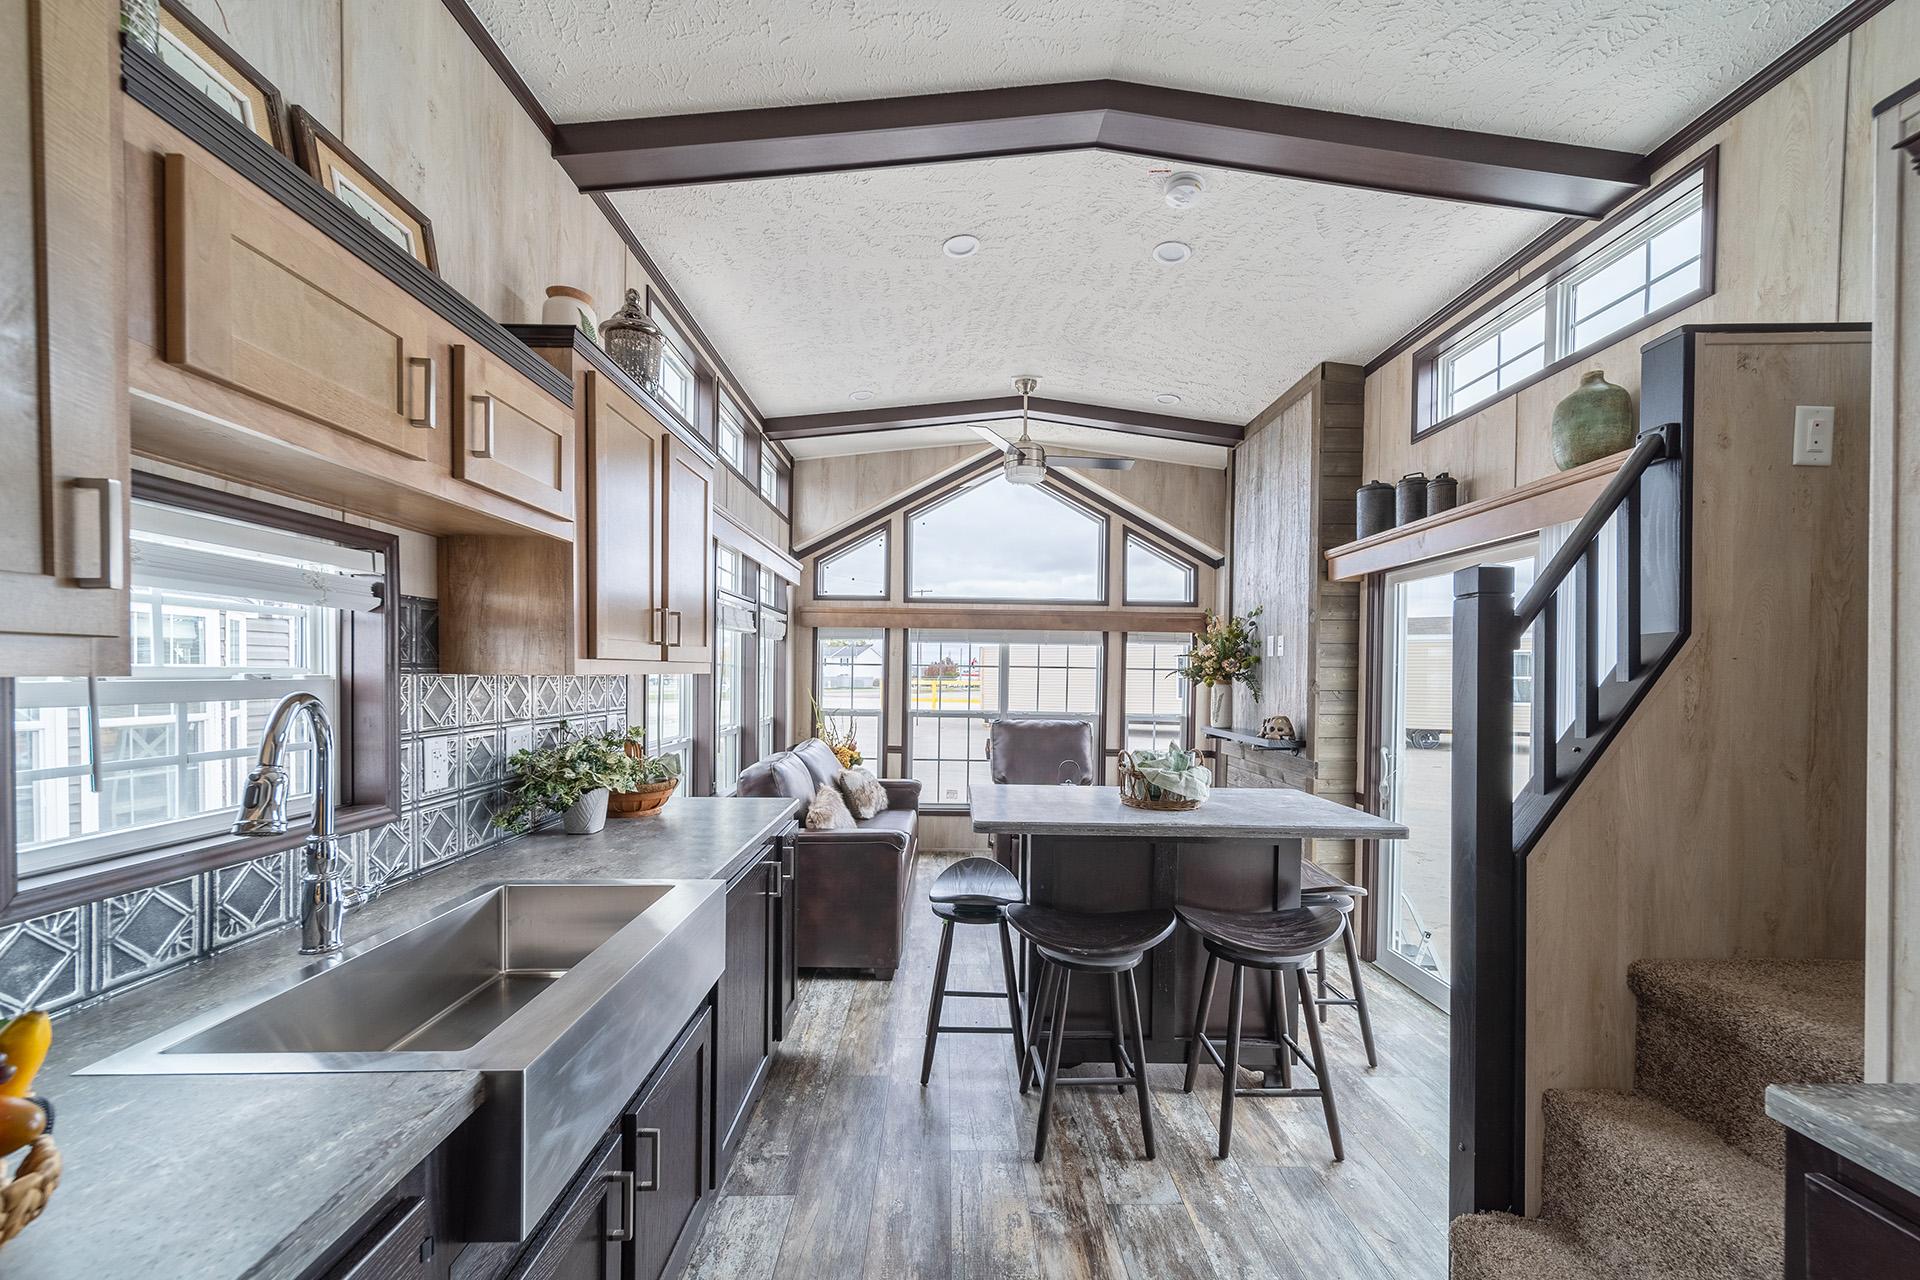 Fairmont Homes Park Model And Vacation Cottage Construction Process